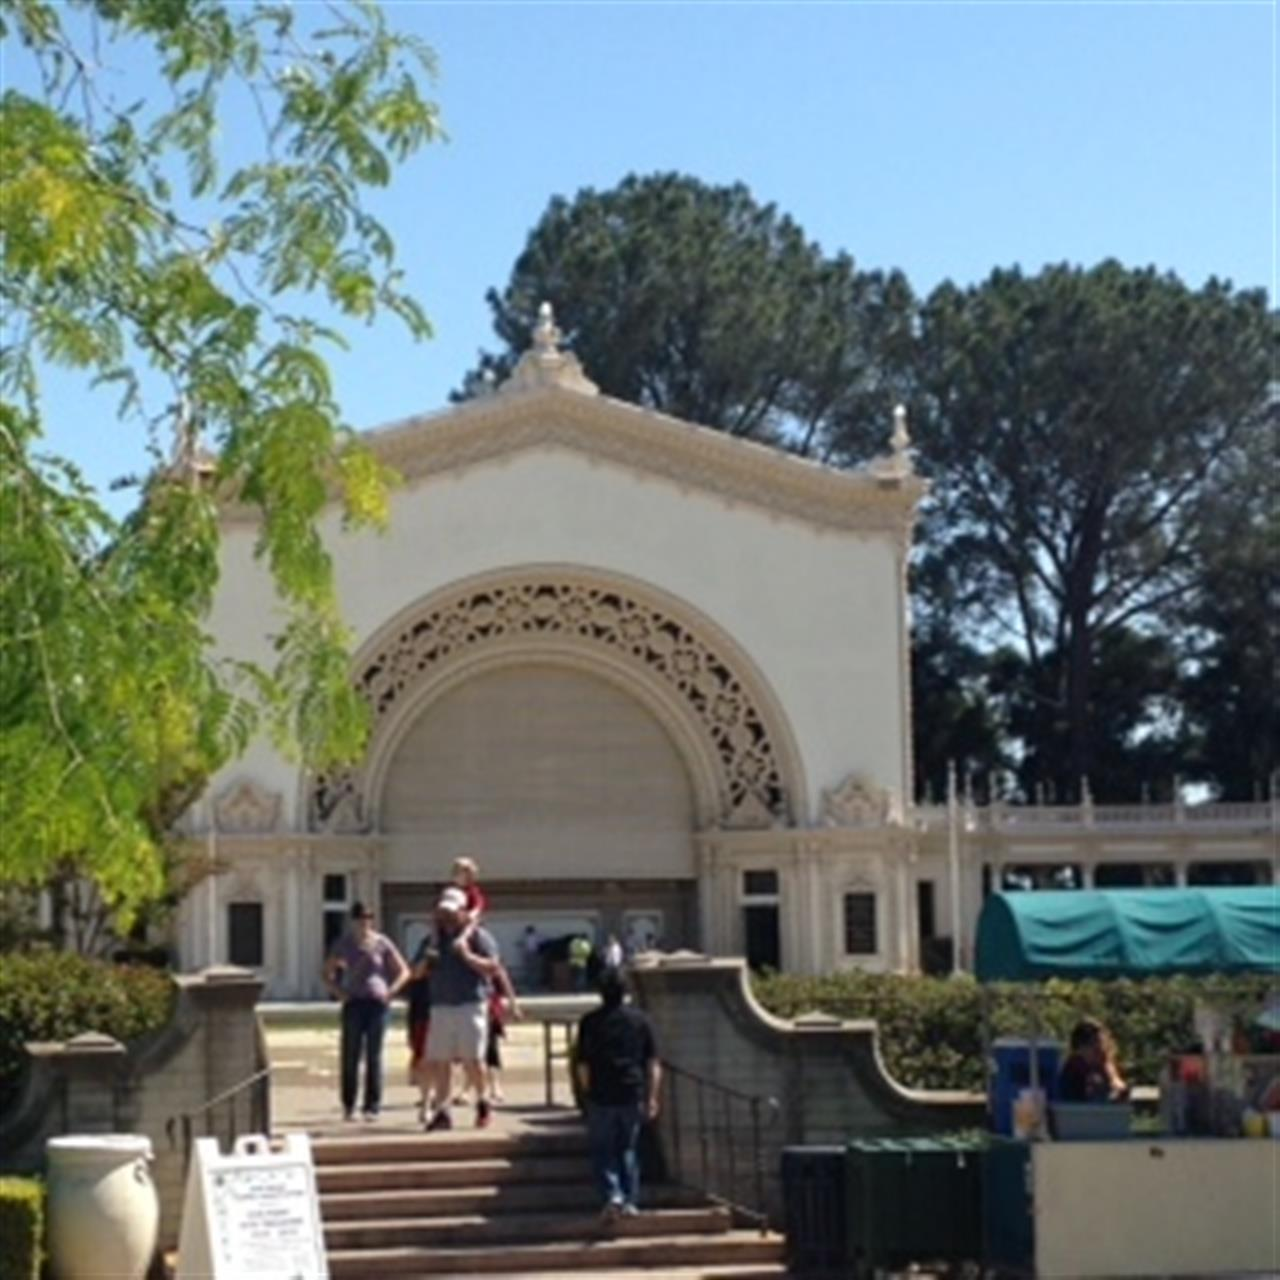 #San Diego #Spreckles Organ Pravillion #LeadingRElocal